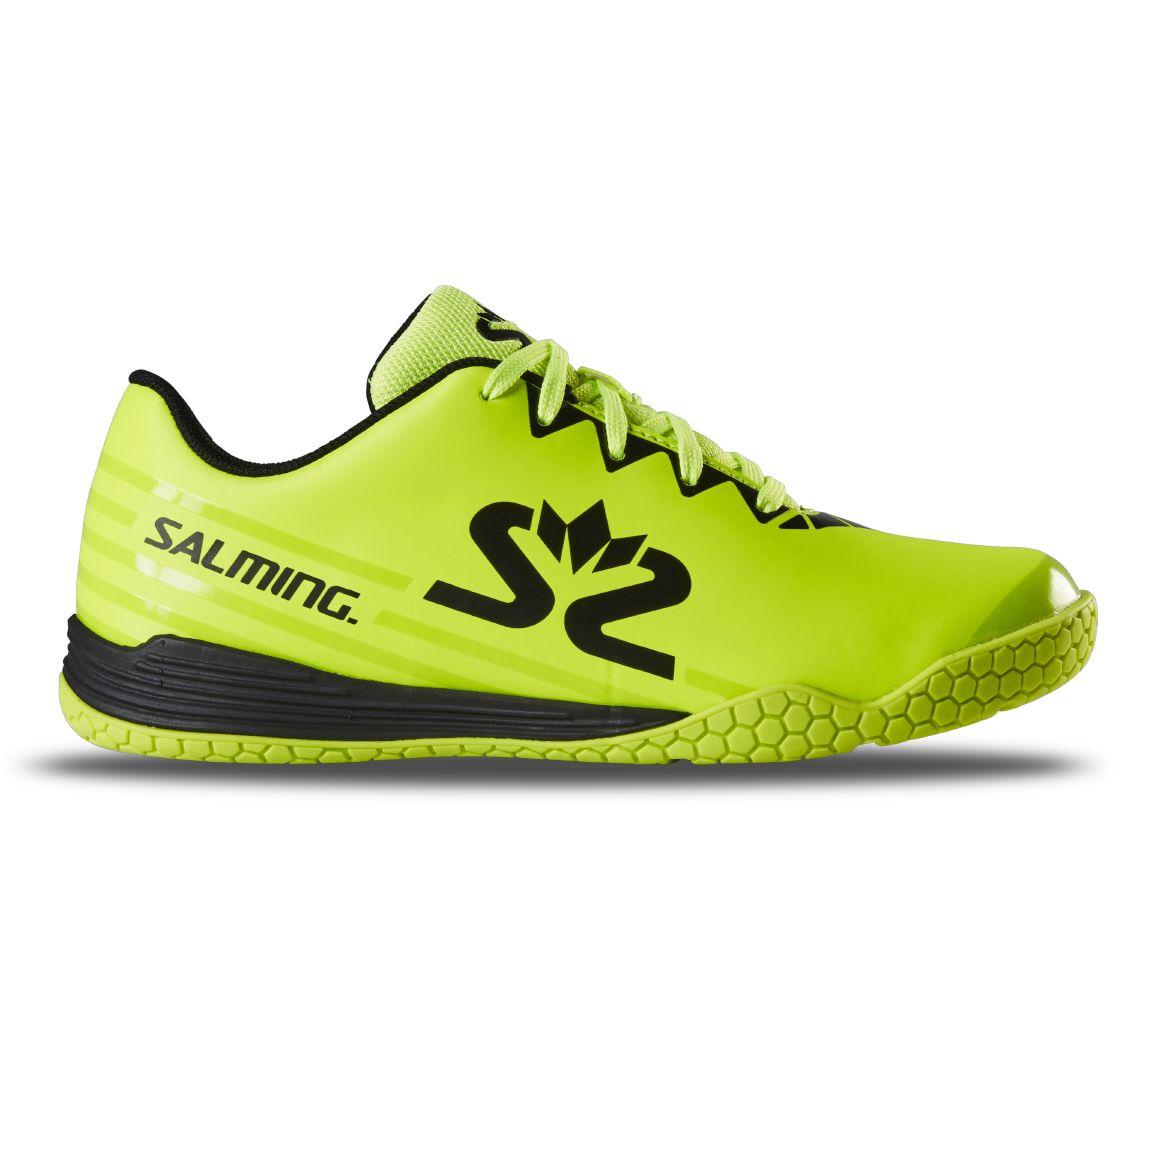 Salming Spark Shoe Kid Fluo Yellow/Black 4 UK - 37 EUR - 23,5 cm